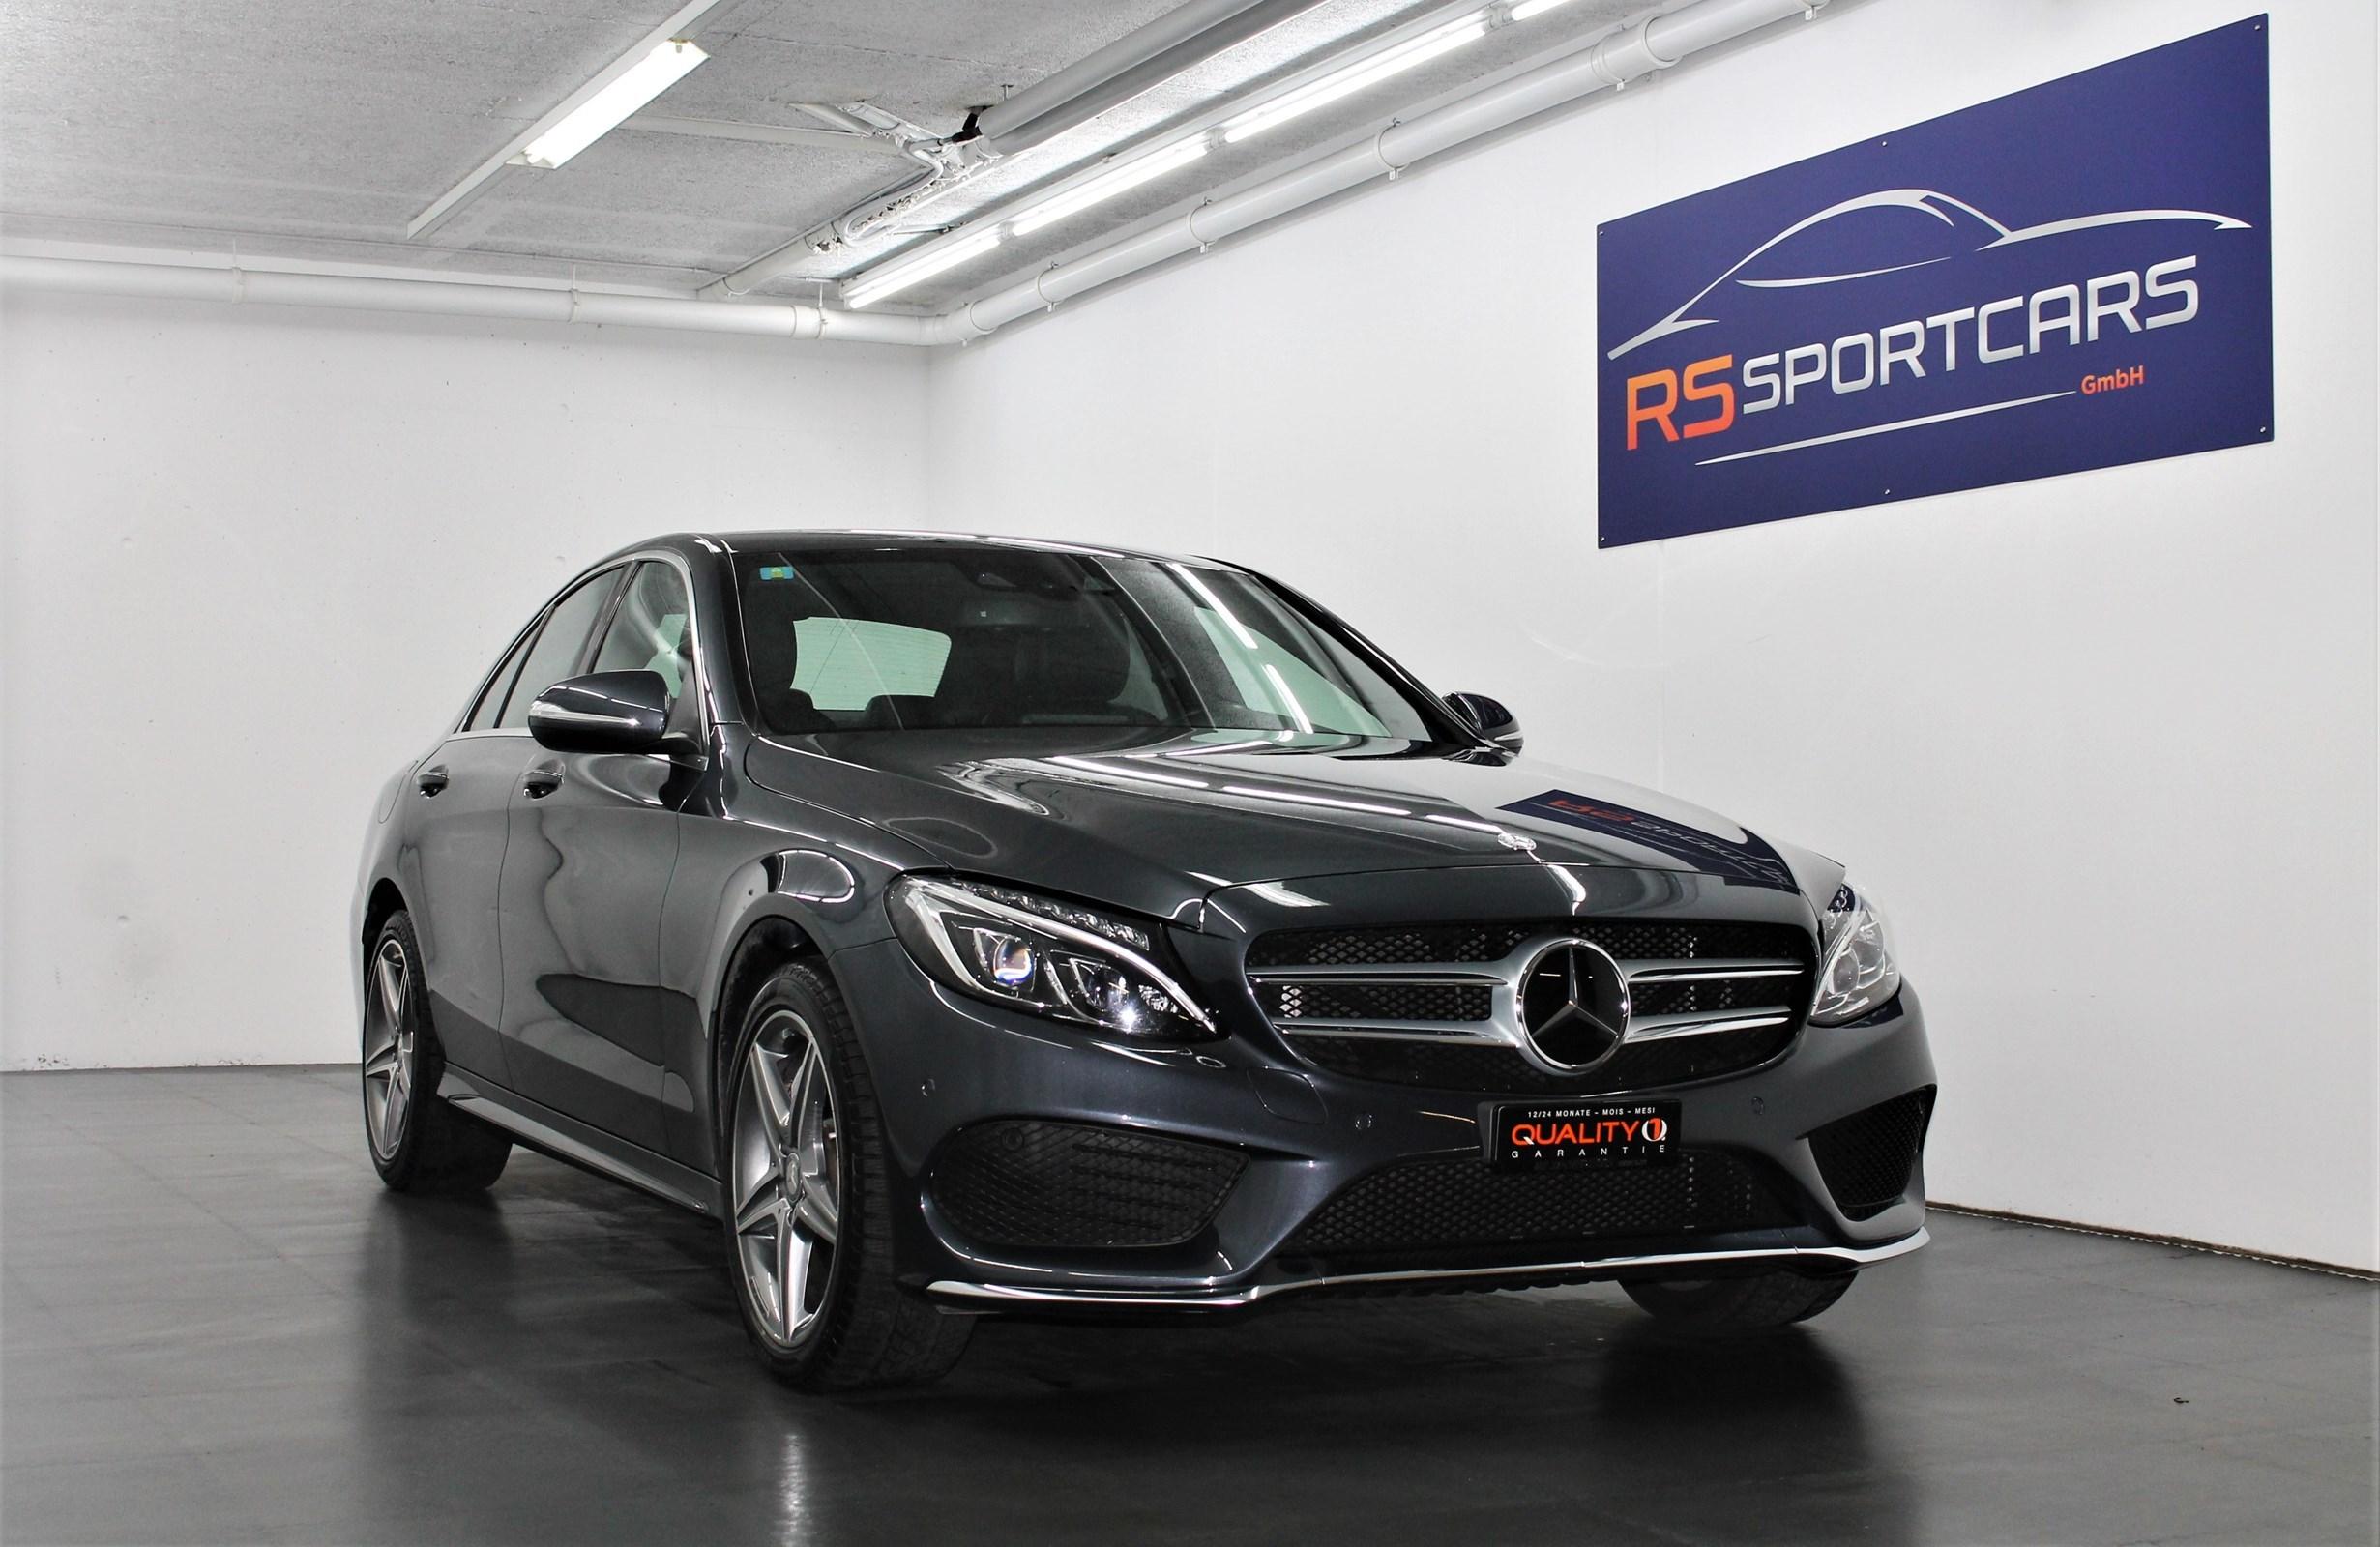 Buy Used Car Sedan Mercedes Benz C Klasse C 250 Bluetec Amg Line 4matic 7g Tronic 47750 Km At 33900 Chf On Carforyou Ch